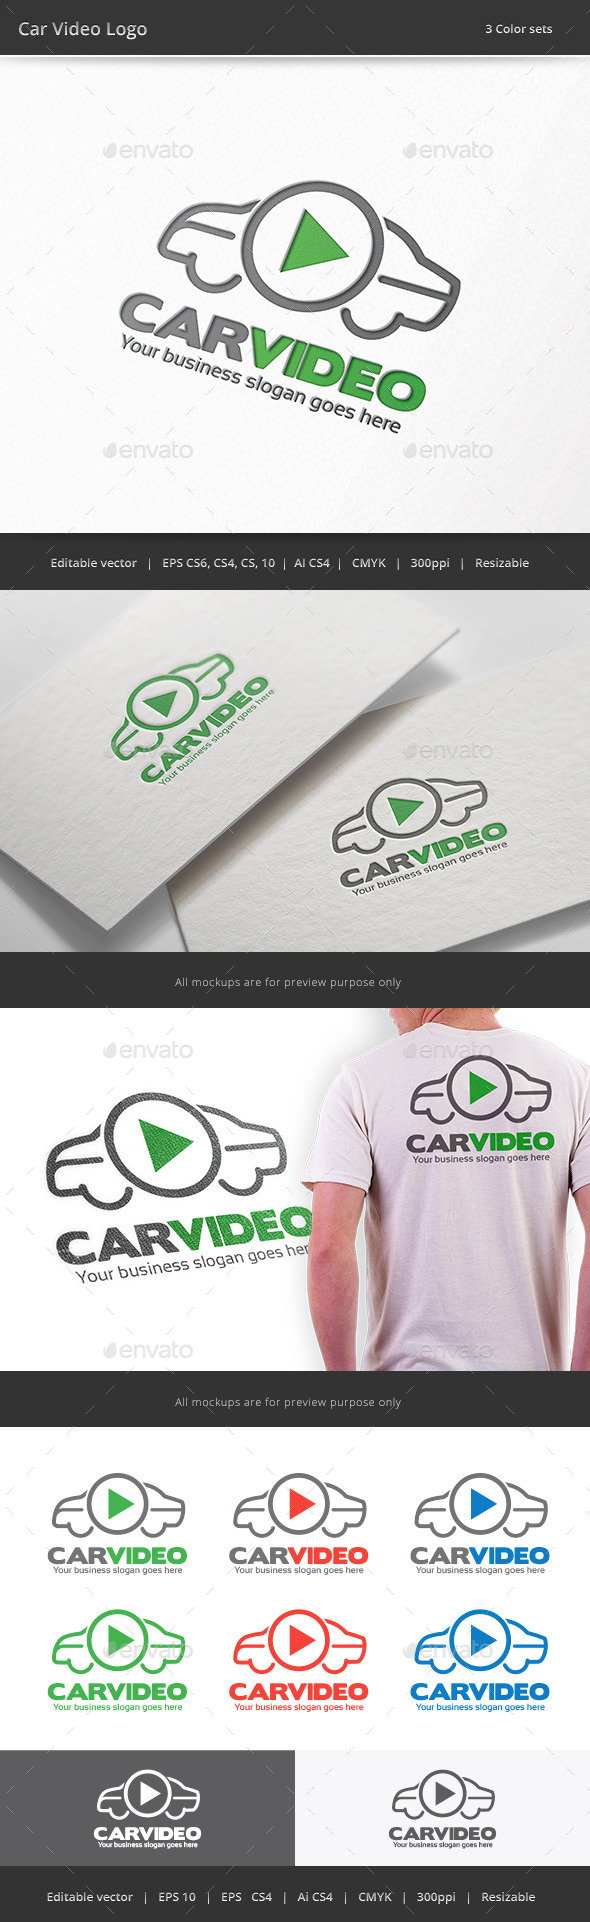 Car Video Logo